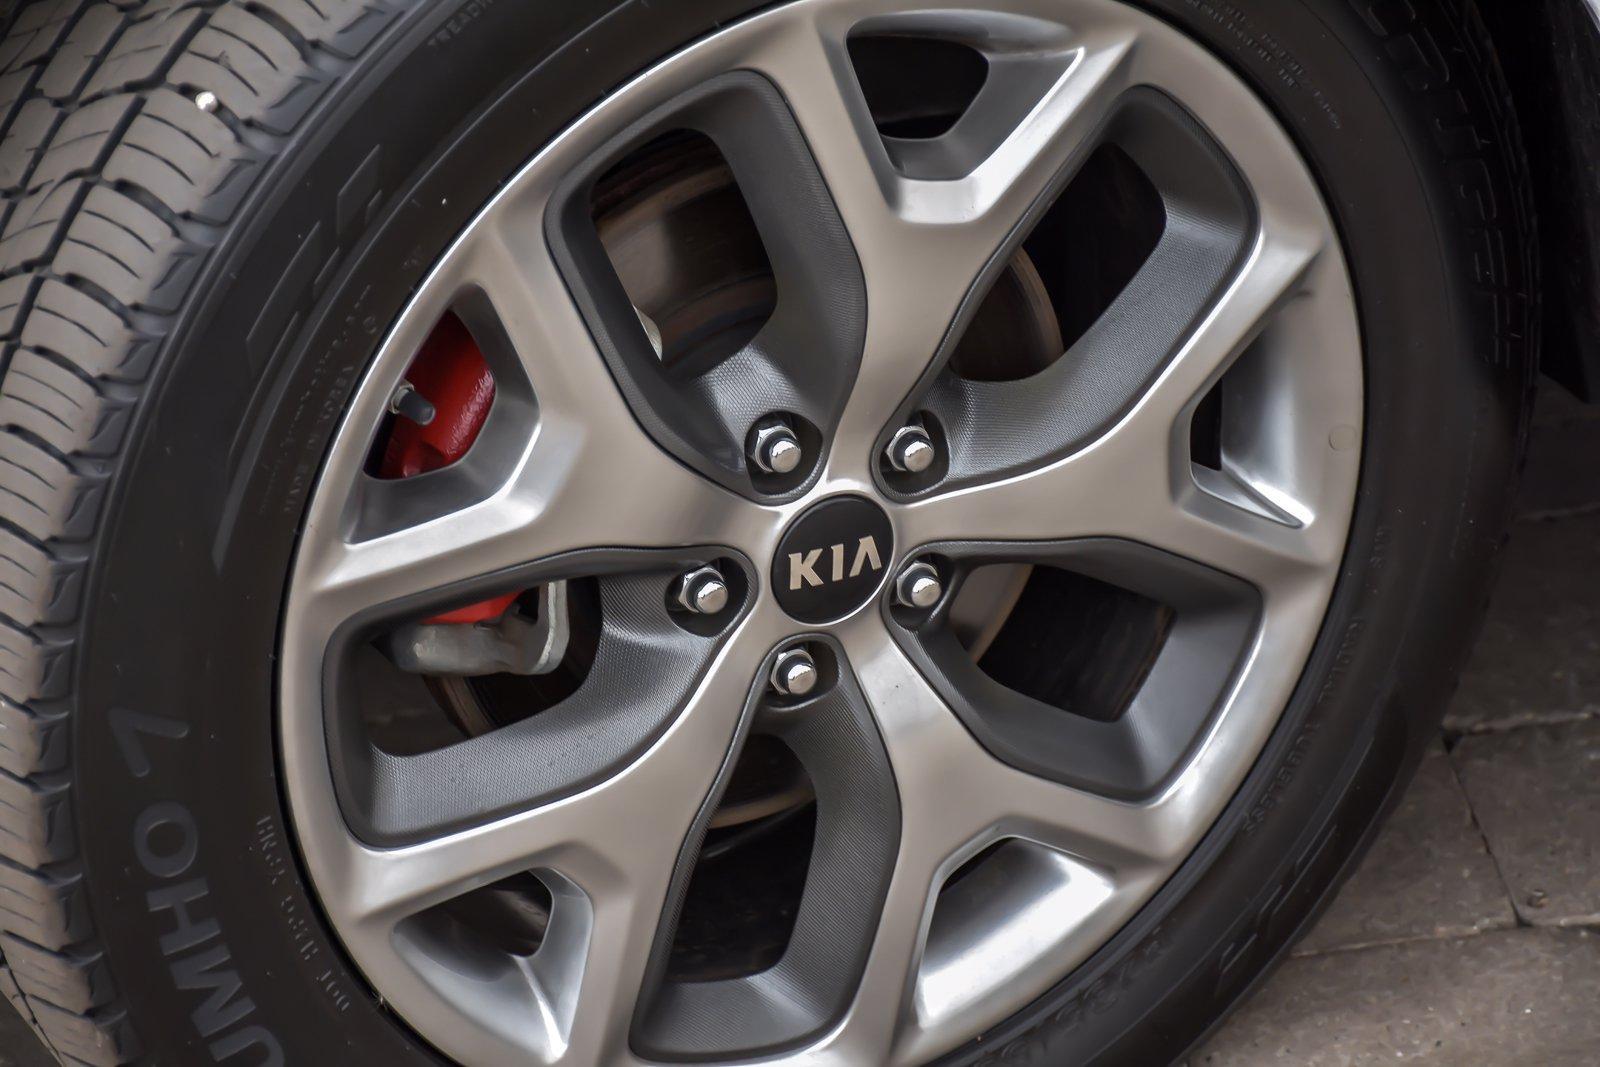 Used 2019 Kia Sorento SX V6, 3rd Row, | Downers Grove, IL